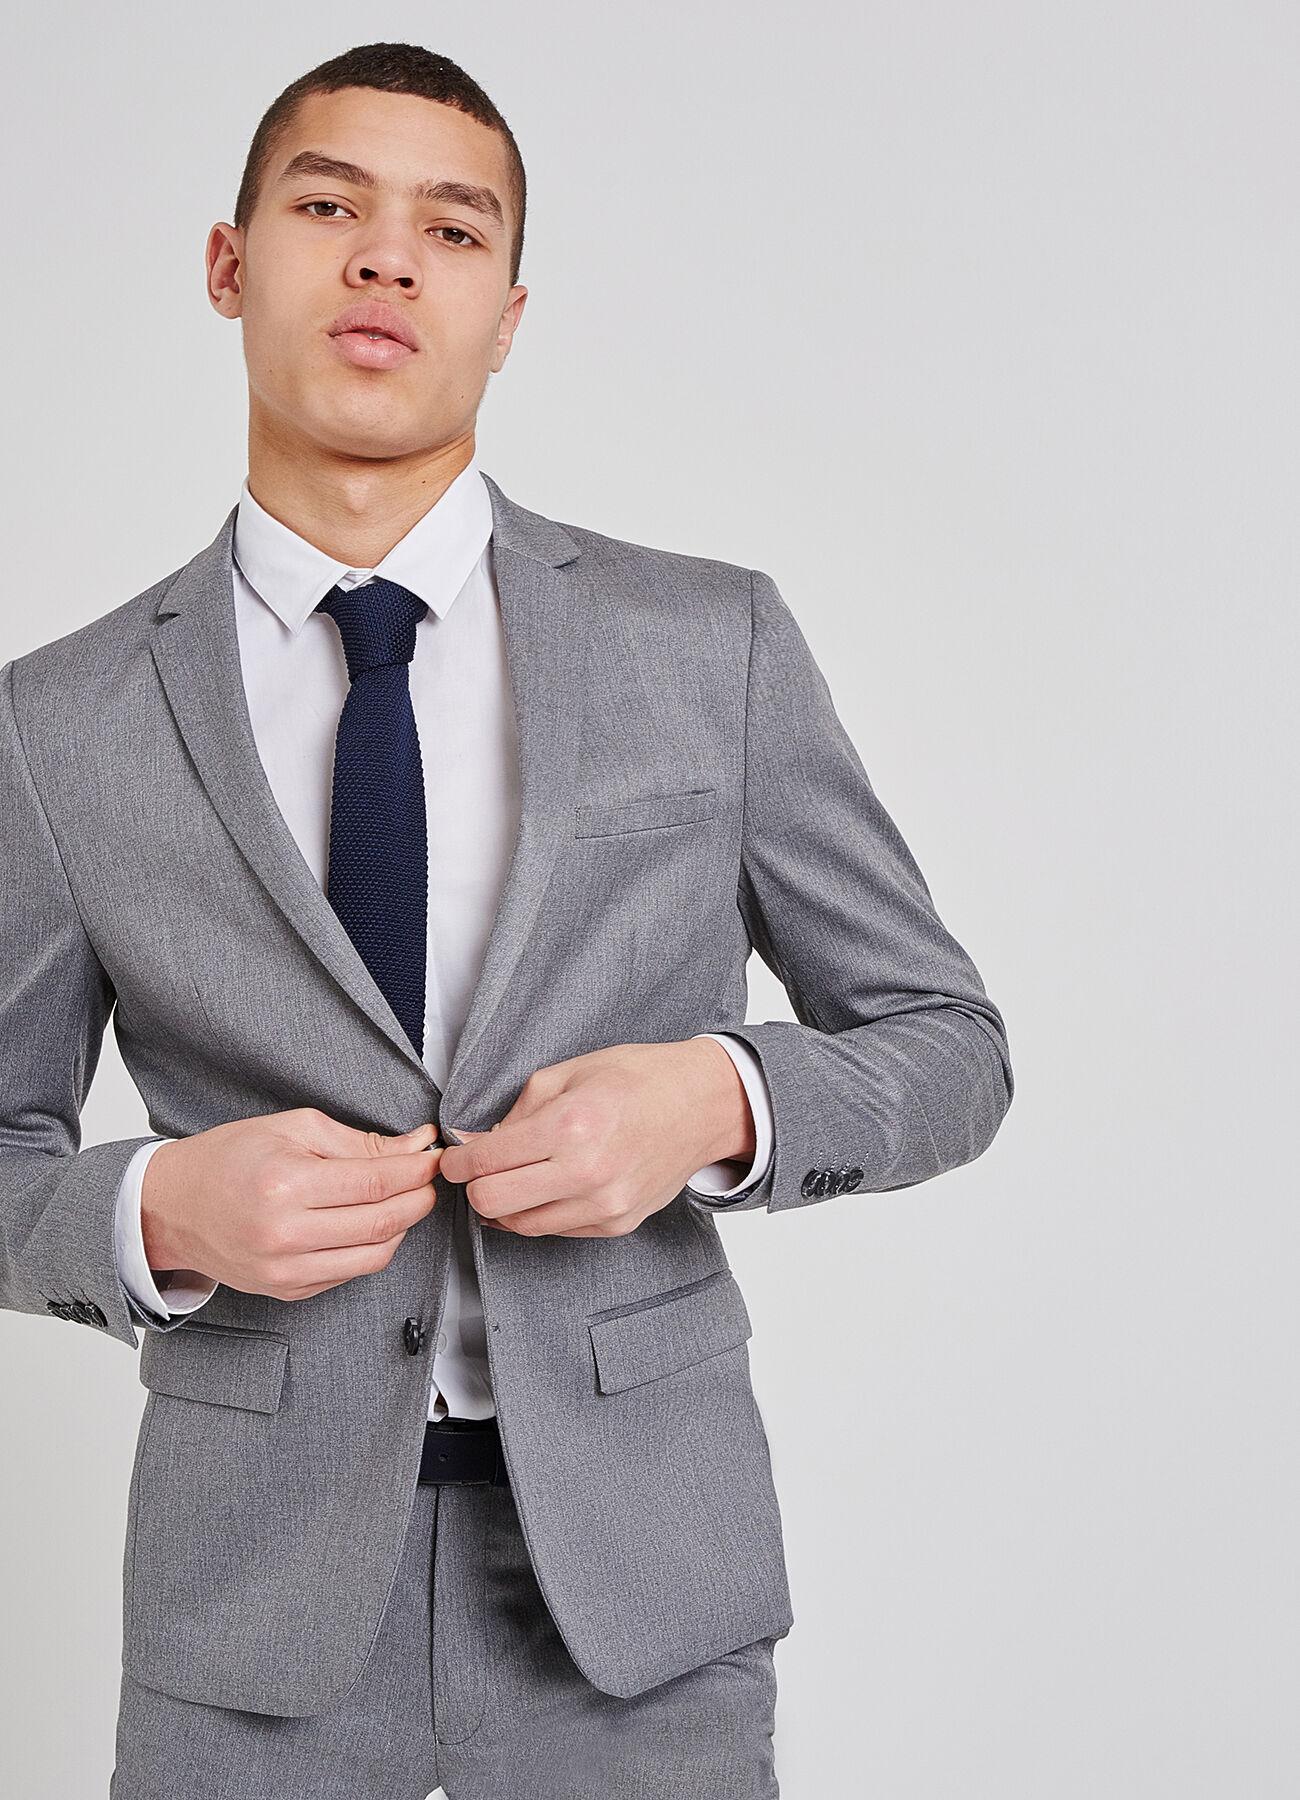 pantalon beige chemise bleu fashion designs. Black Bedroom Furniture Sets. Home Design Ideas